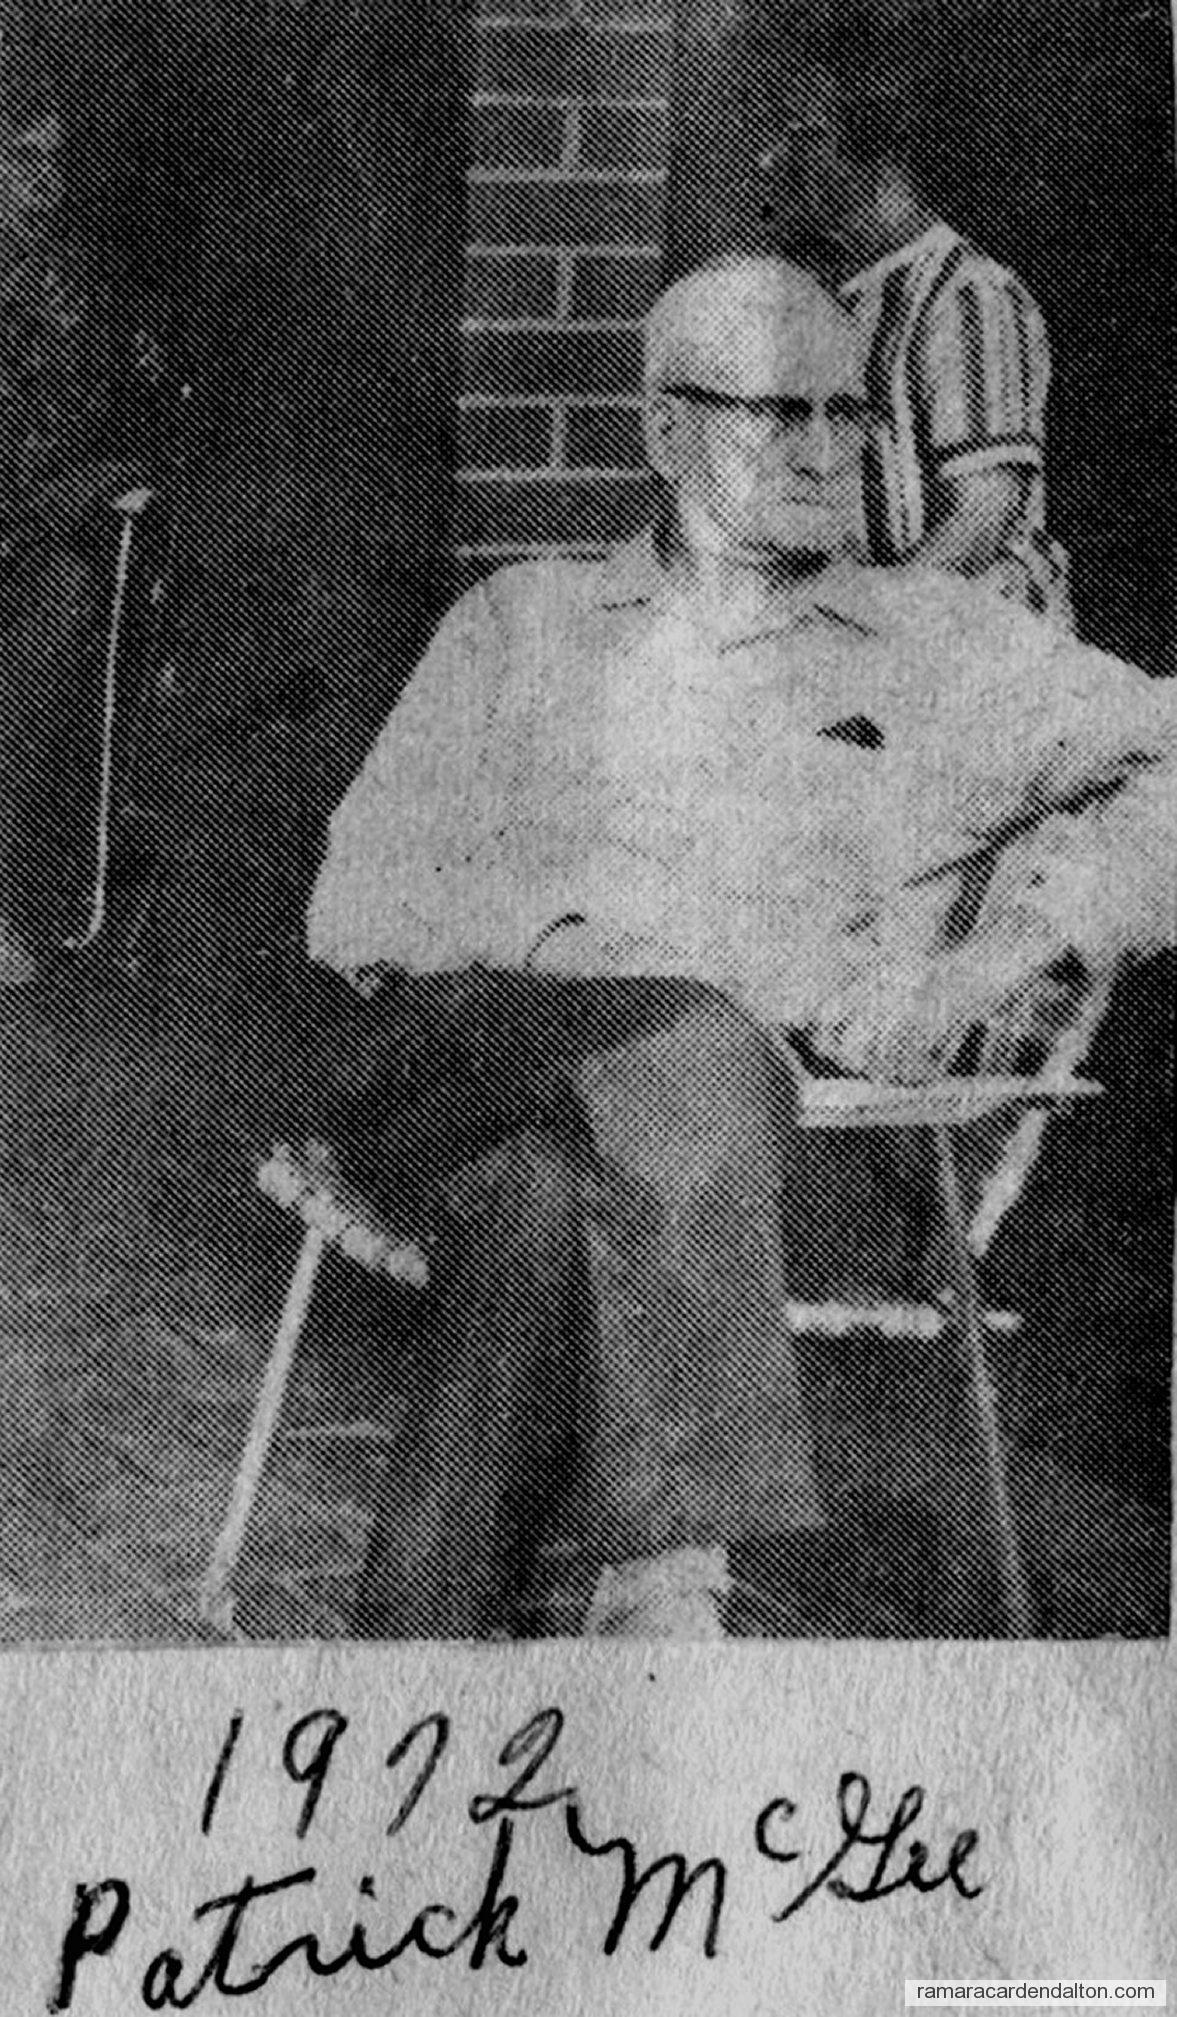 Patrick McGee-1972